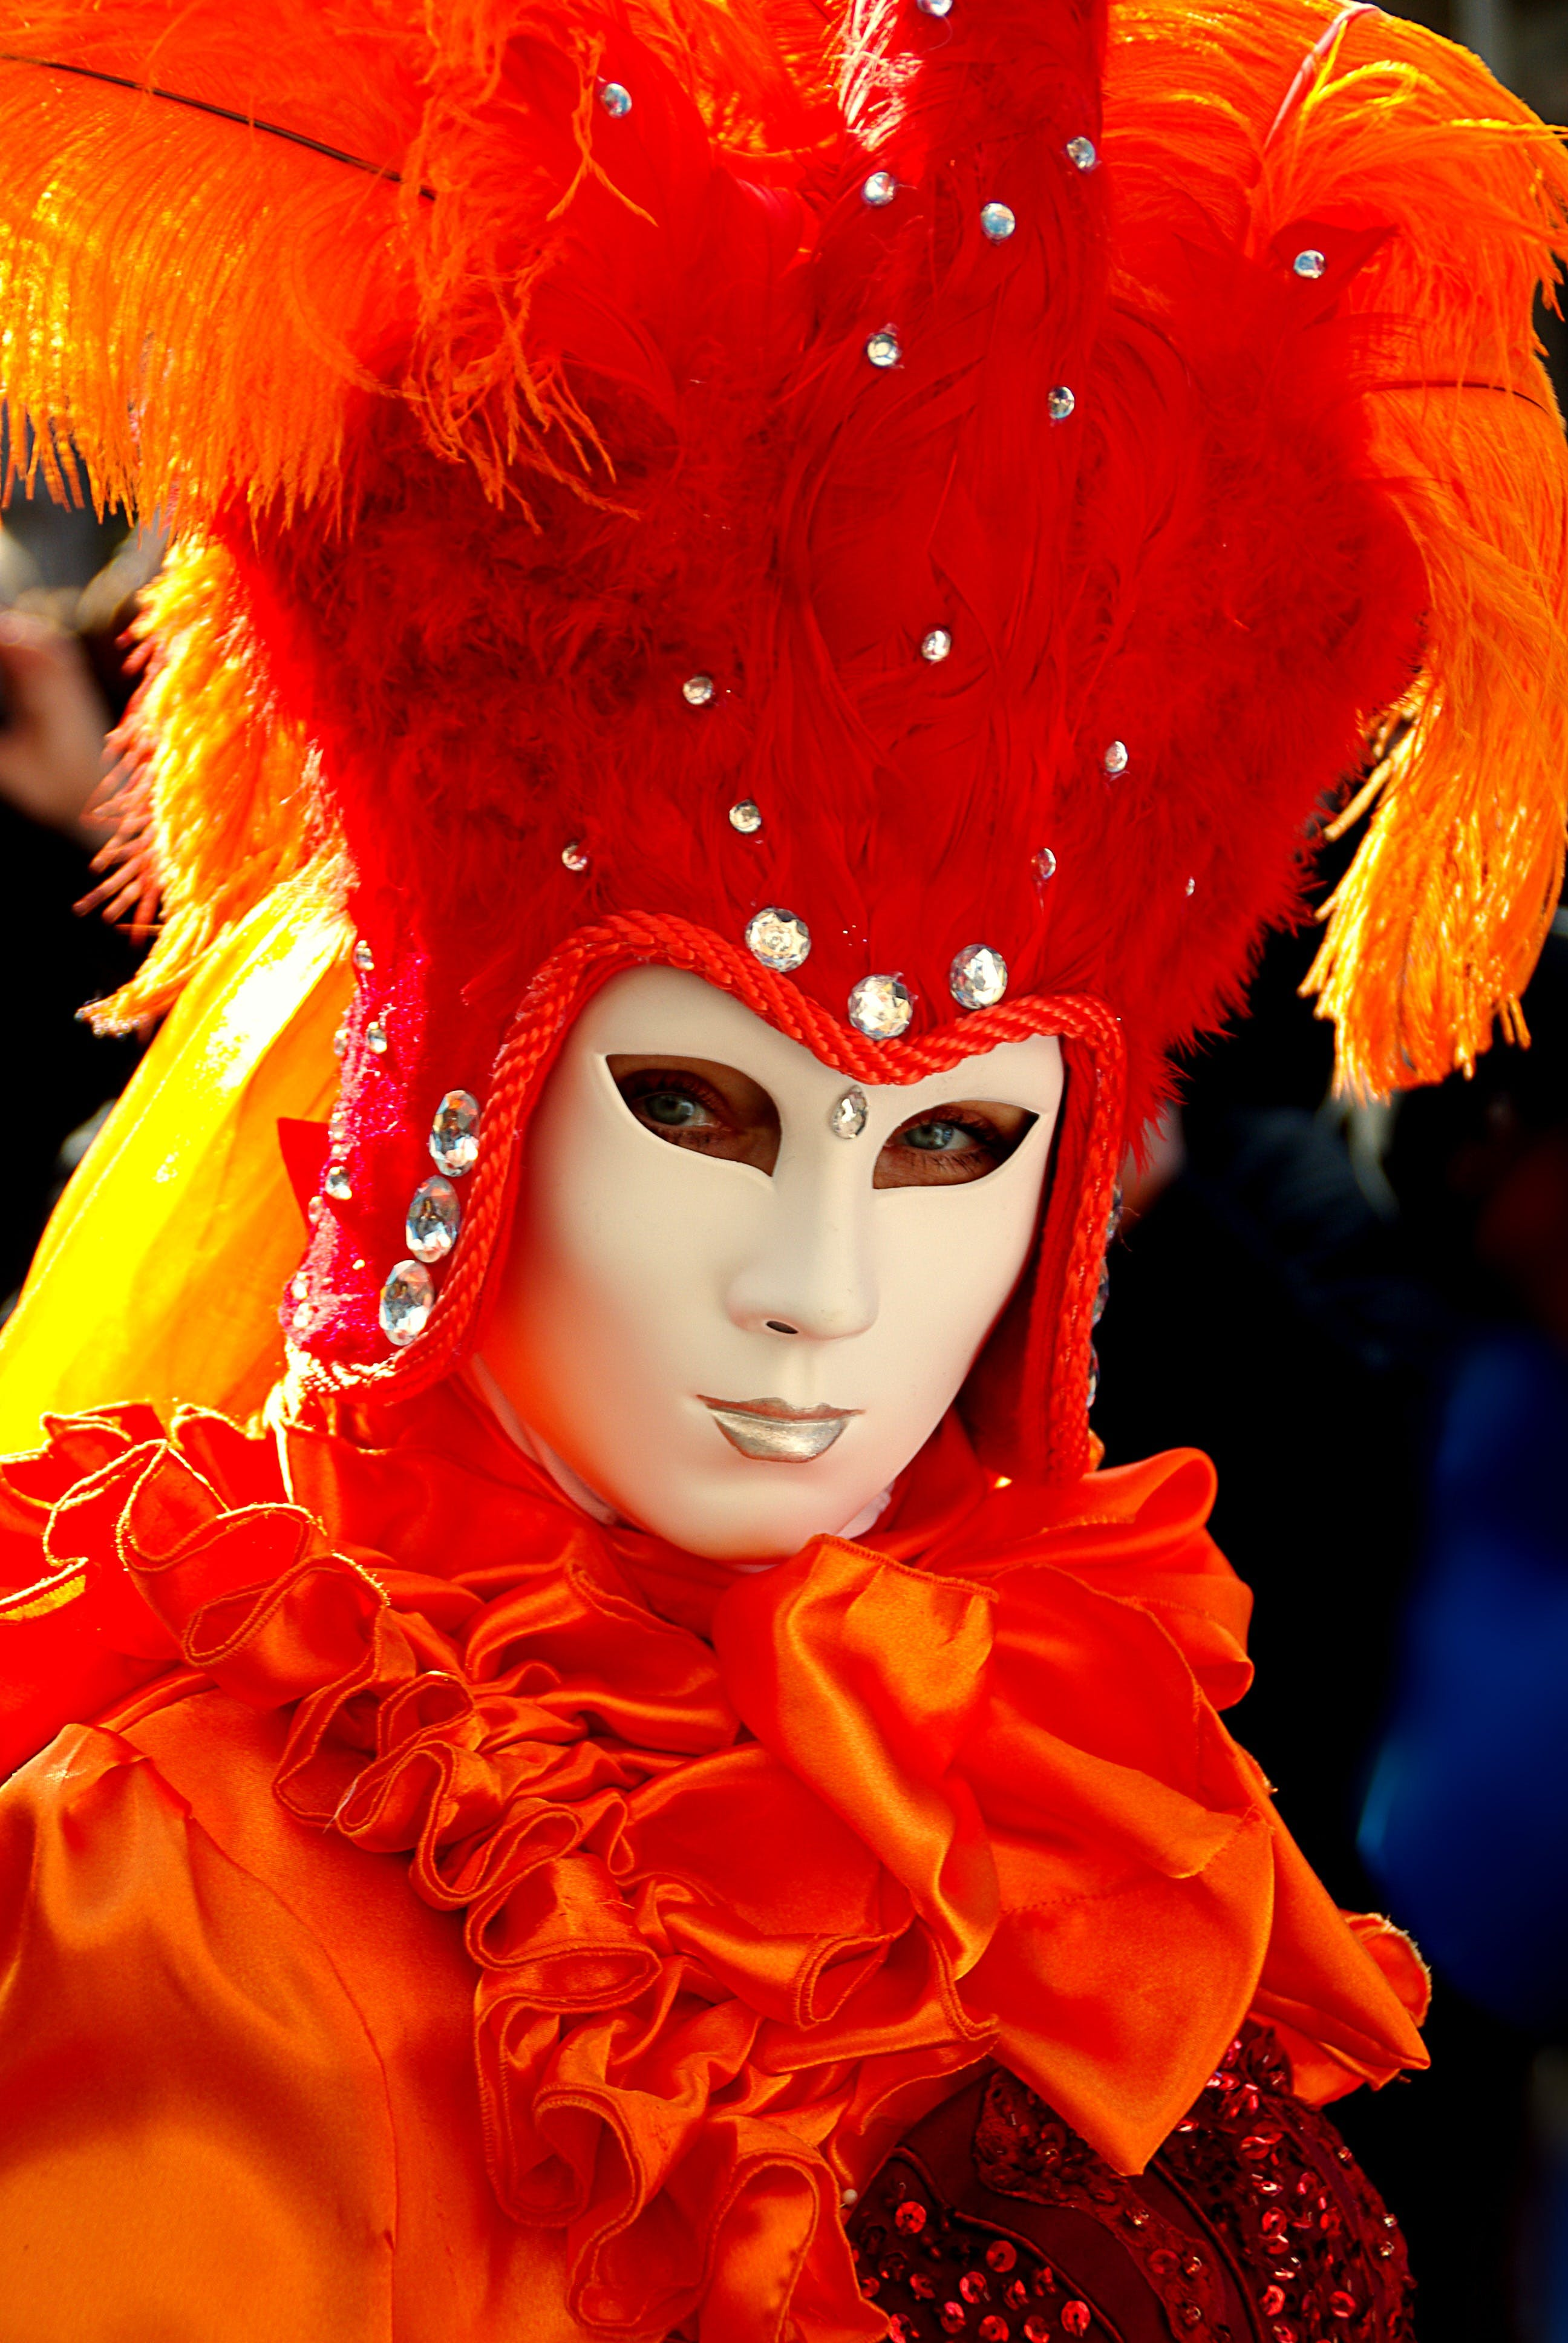 Kostenloses Stock Foto zu karneval, kostüm, maskenspiel, person